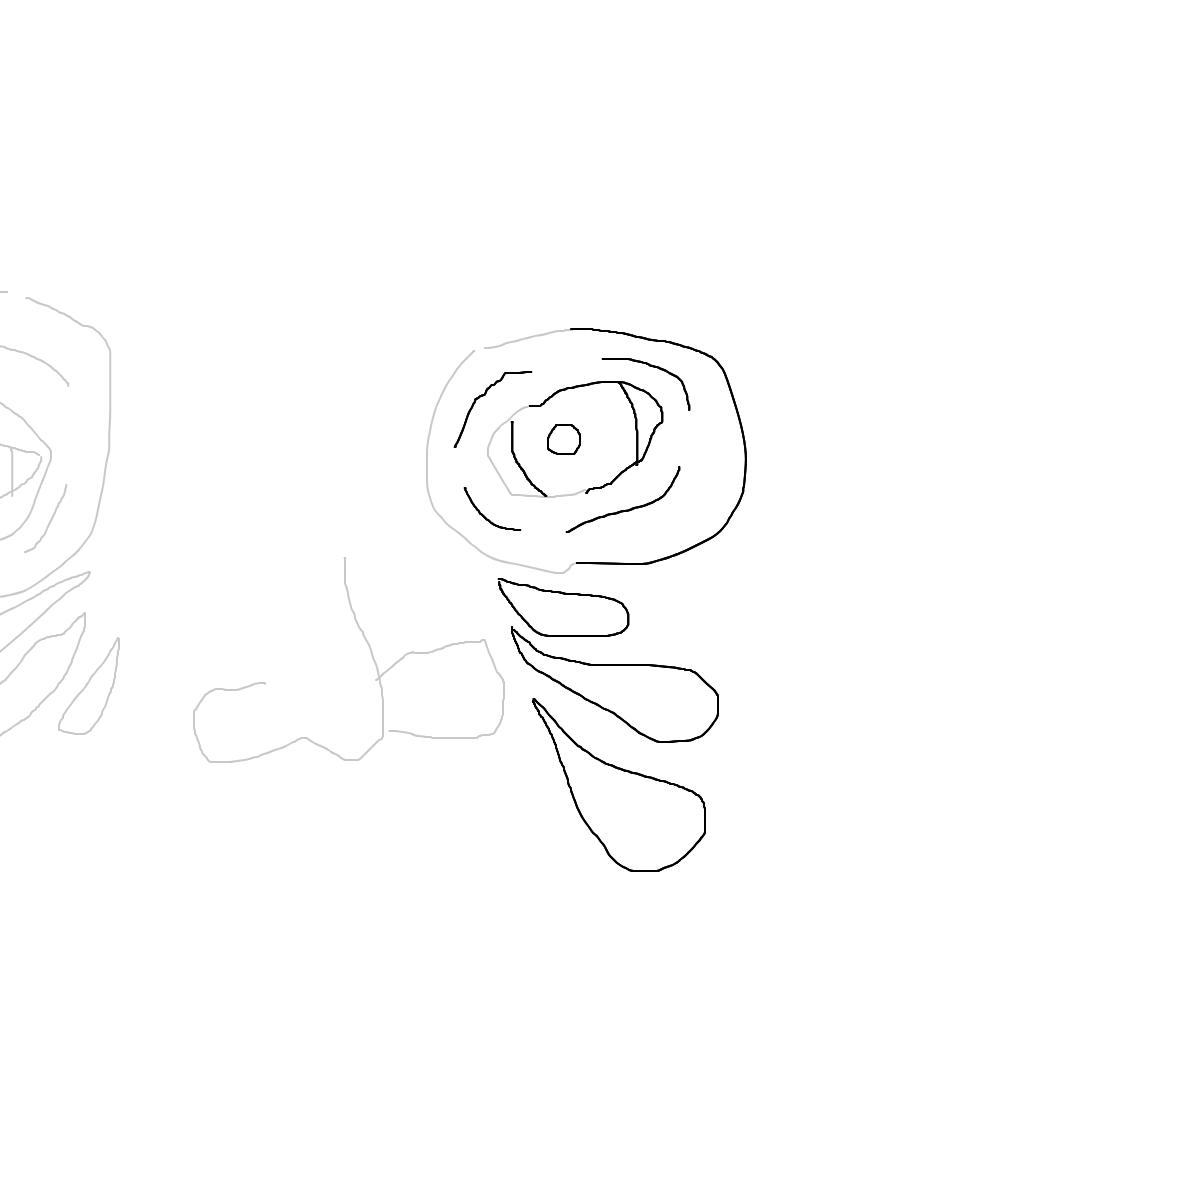 BAAAM drawing#24174 lat:46.5207901000976560lng: 6.6339125633239750